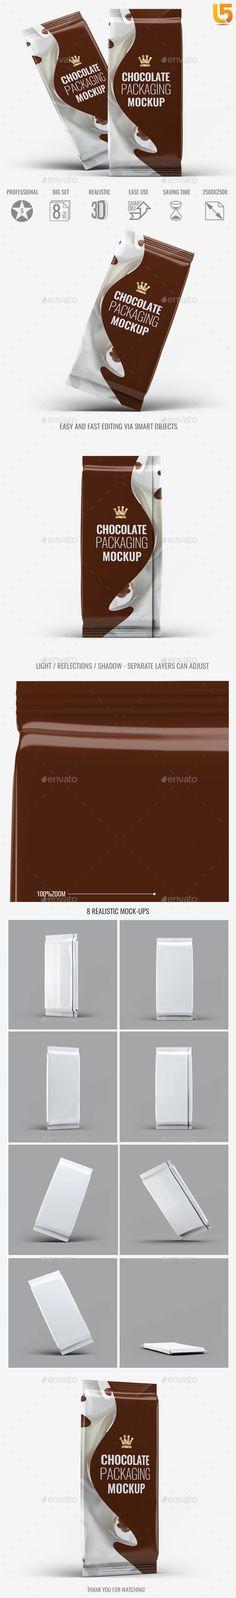 Chocolate Packaging Mock-Up